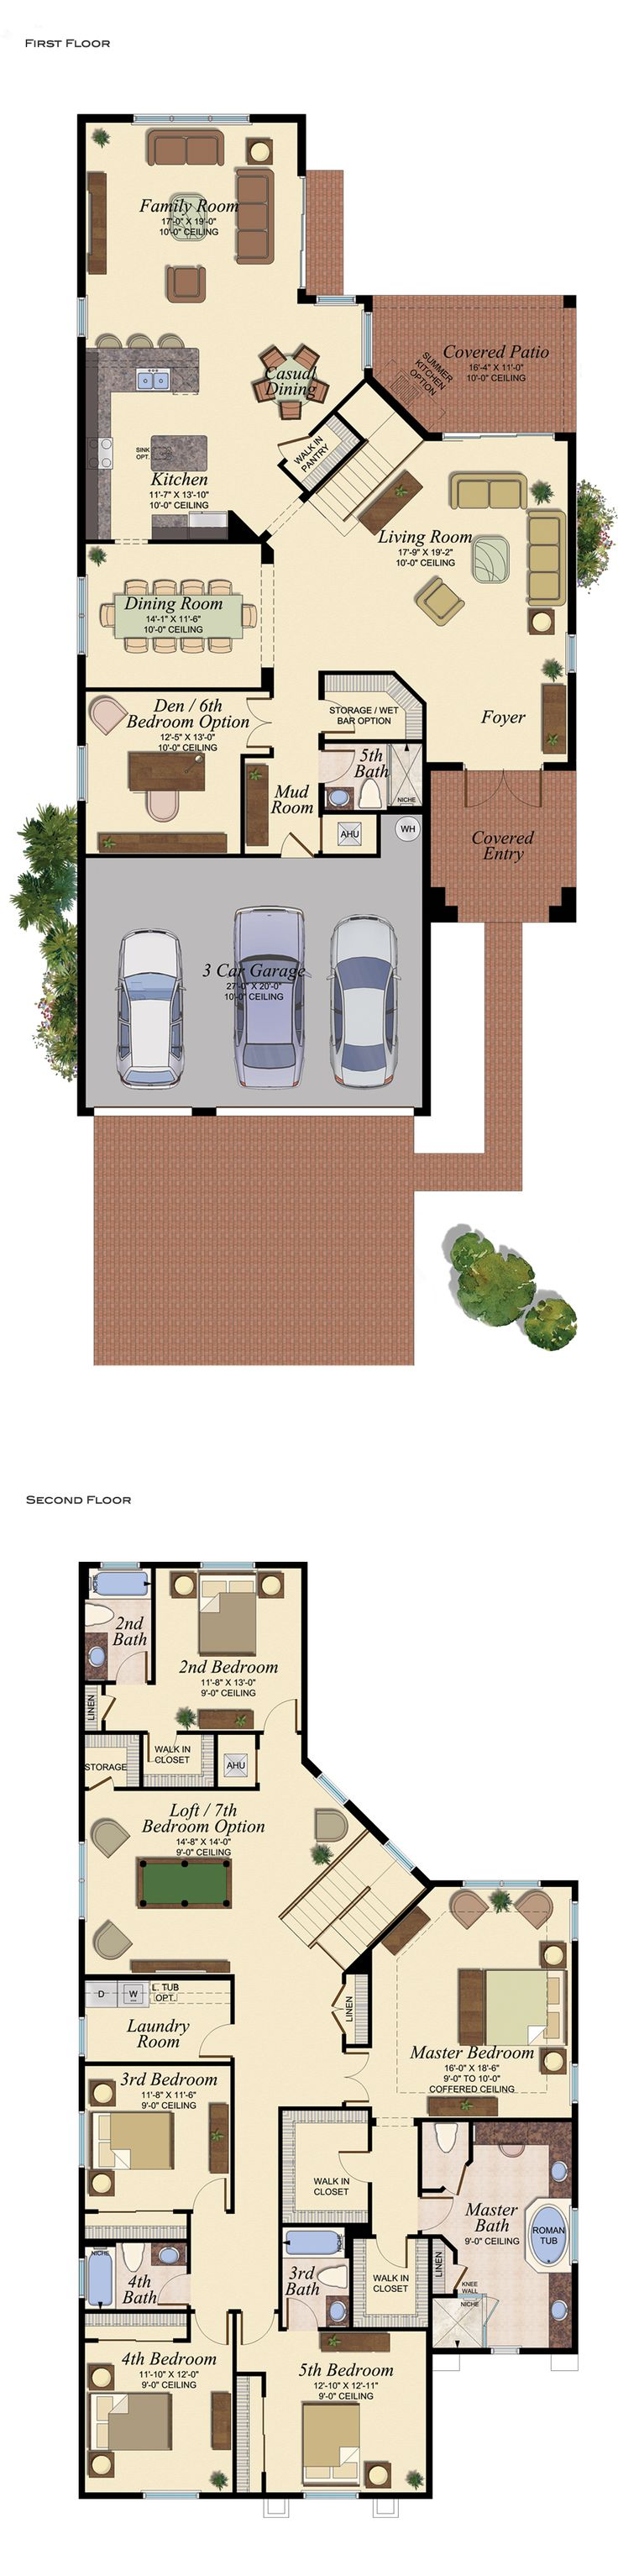 5 bed+, 5 bath, den // love this layout